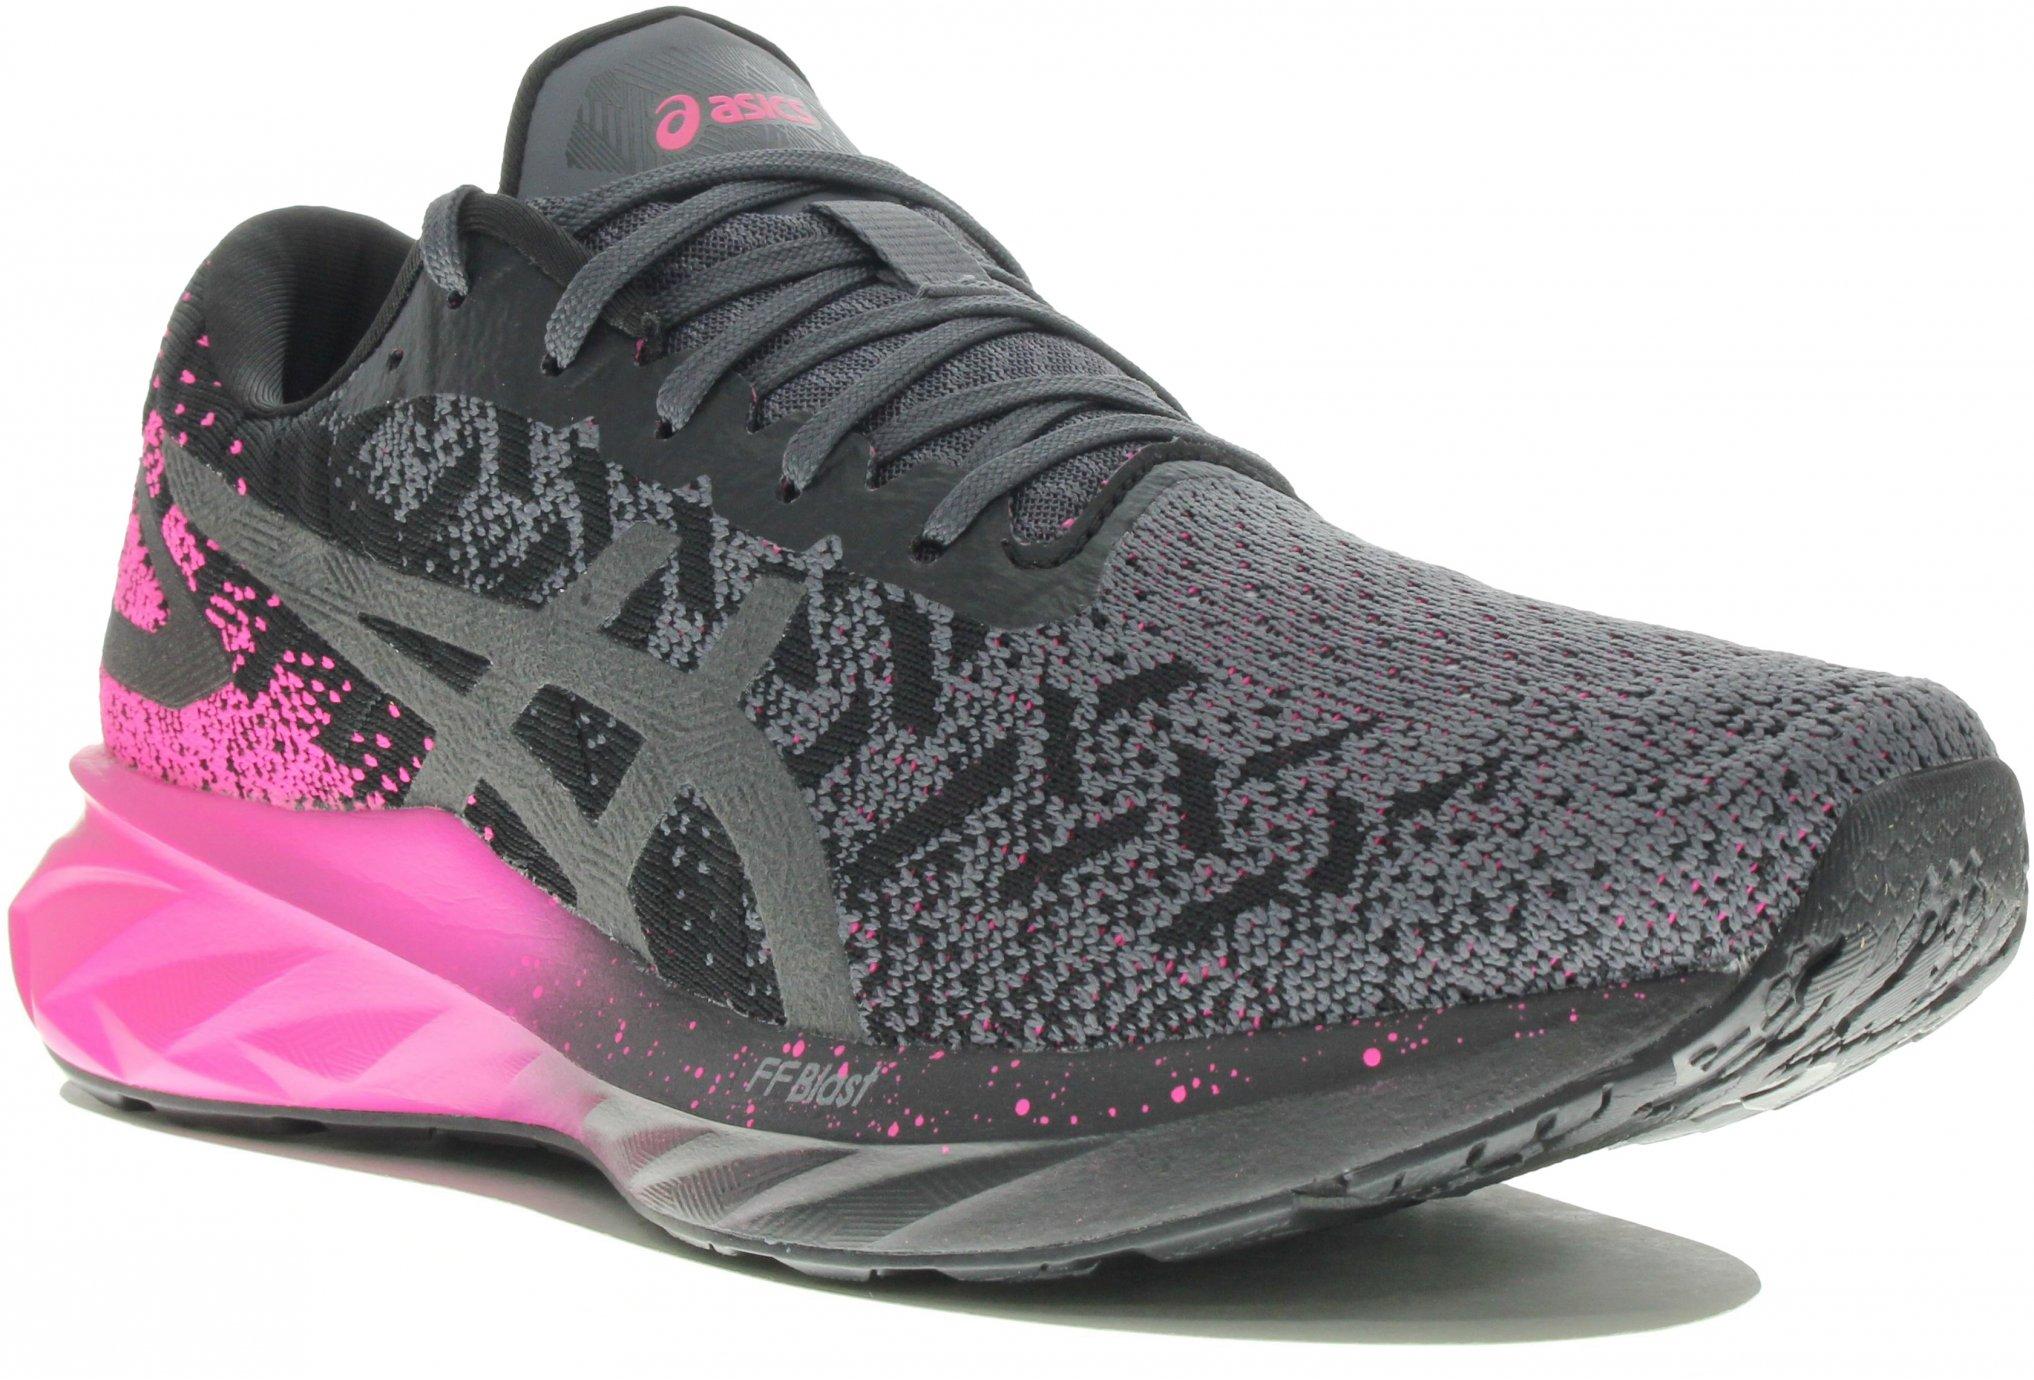 Asics Dynablast Chaussures running femme